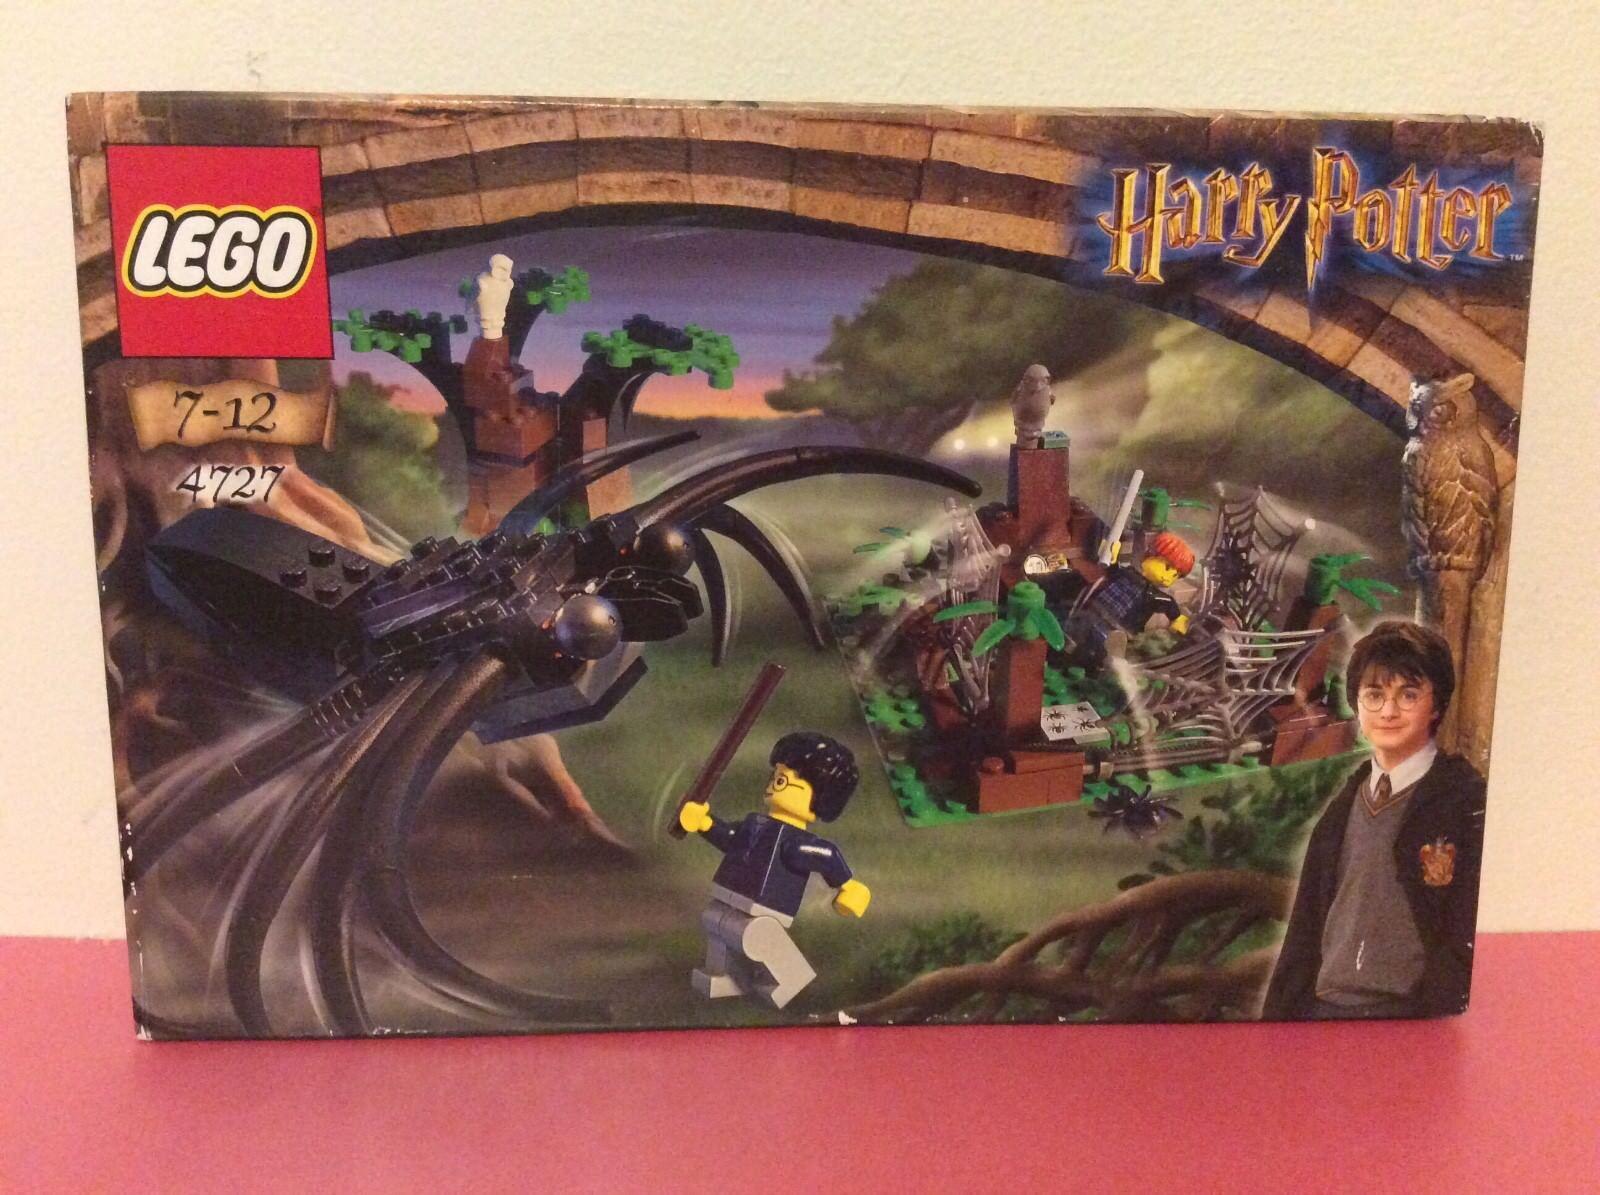 Lego HARRY POTTER Aragog (Chamber of Secrets) - BRAND NEW & SEALED